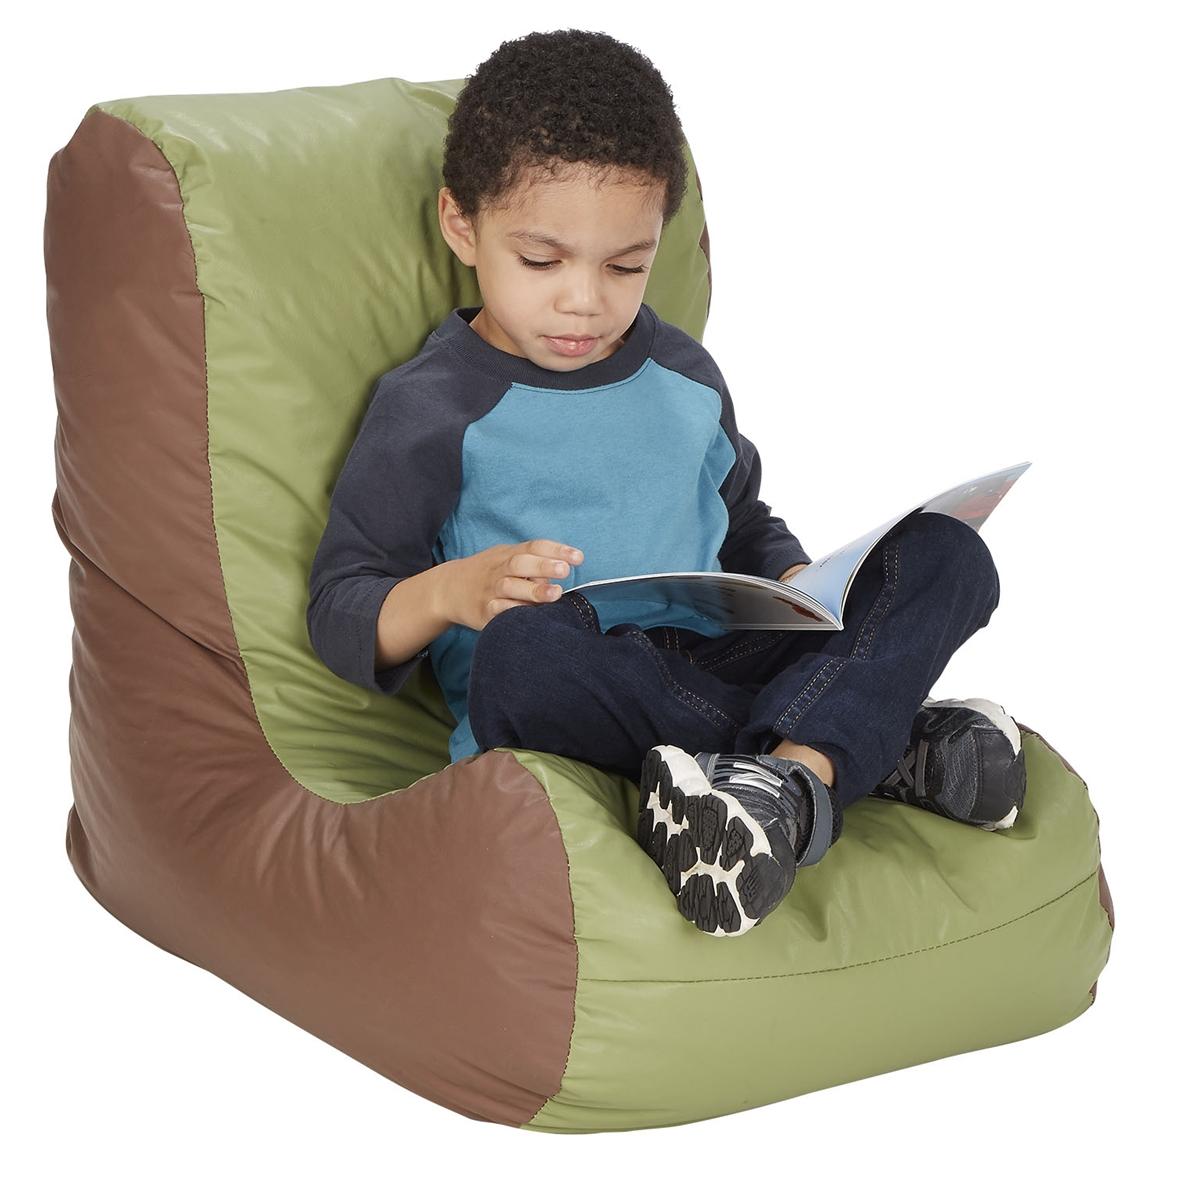 Marvelous High Back Bean Bag Chairs Beckers School Supplies Customarchery Wood Chair Design Ideas Customarcherynet